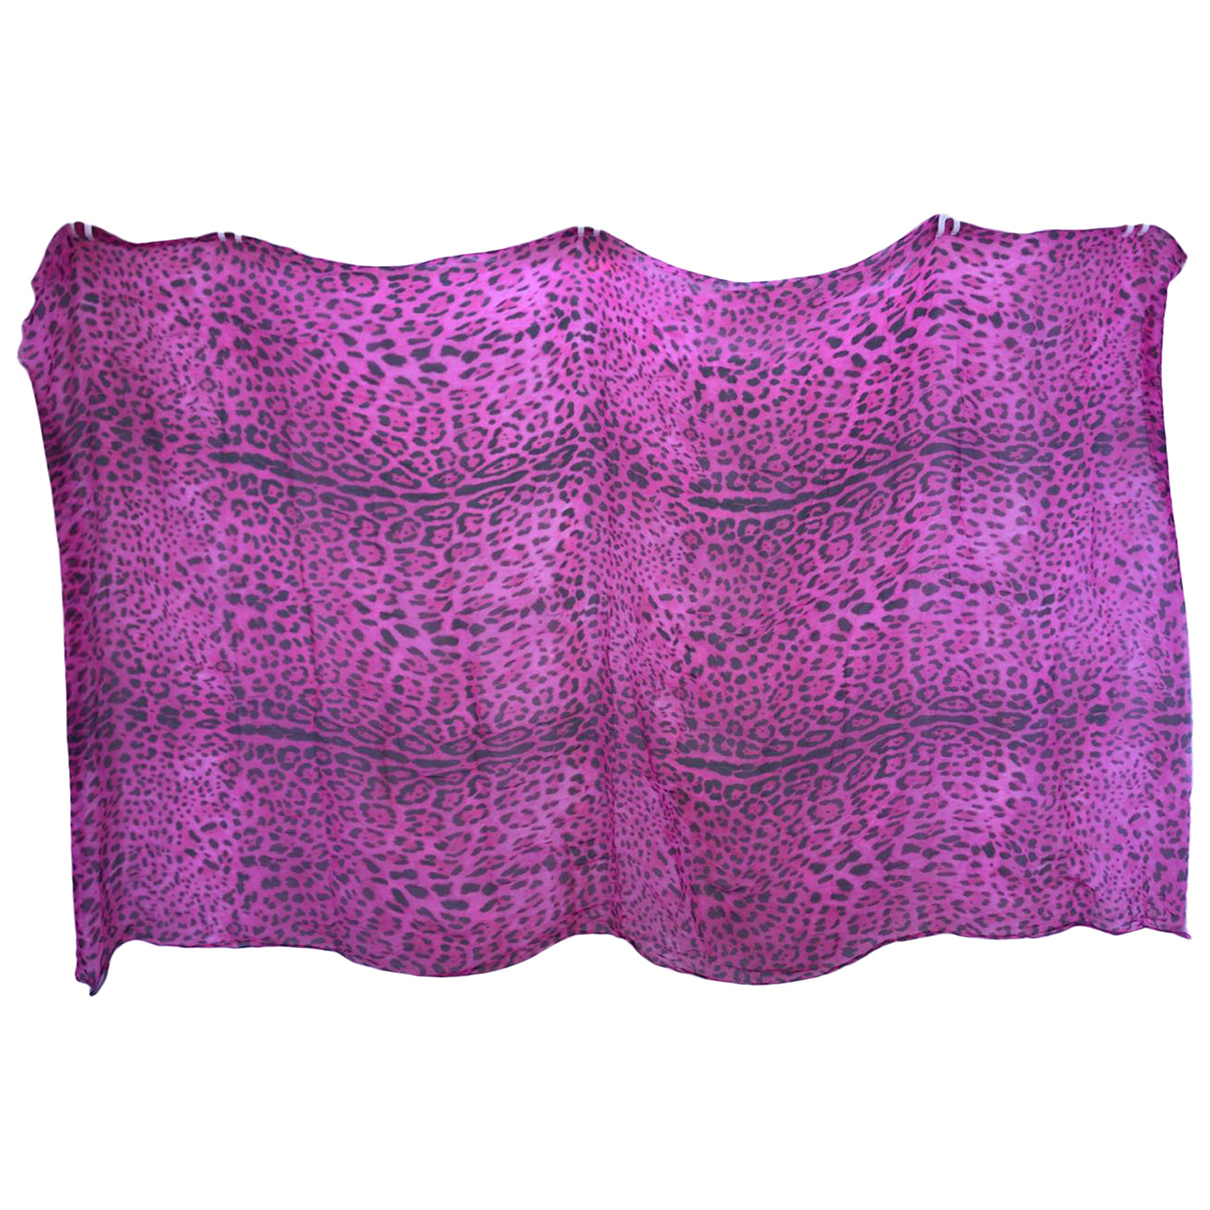 Dolce & Gabbana N Pink Silk scarf for Women N